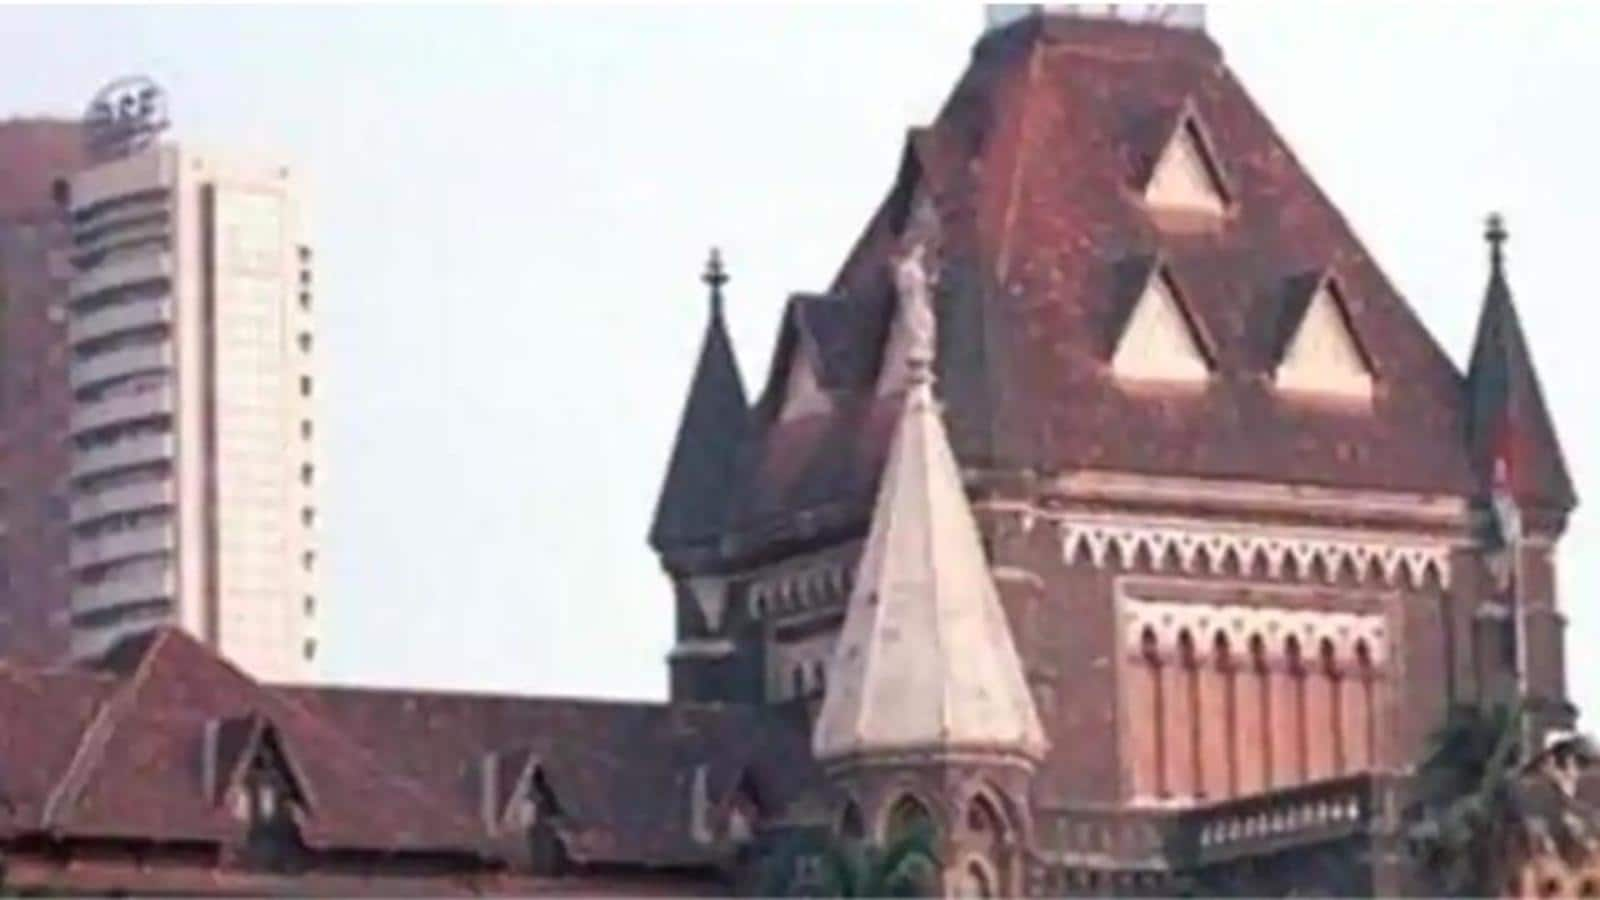 Rape survivor can terminate 29-week pregnancy: Bombay high court